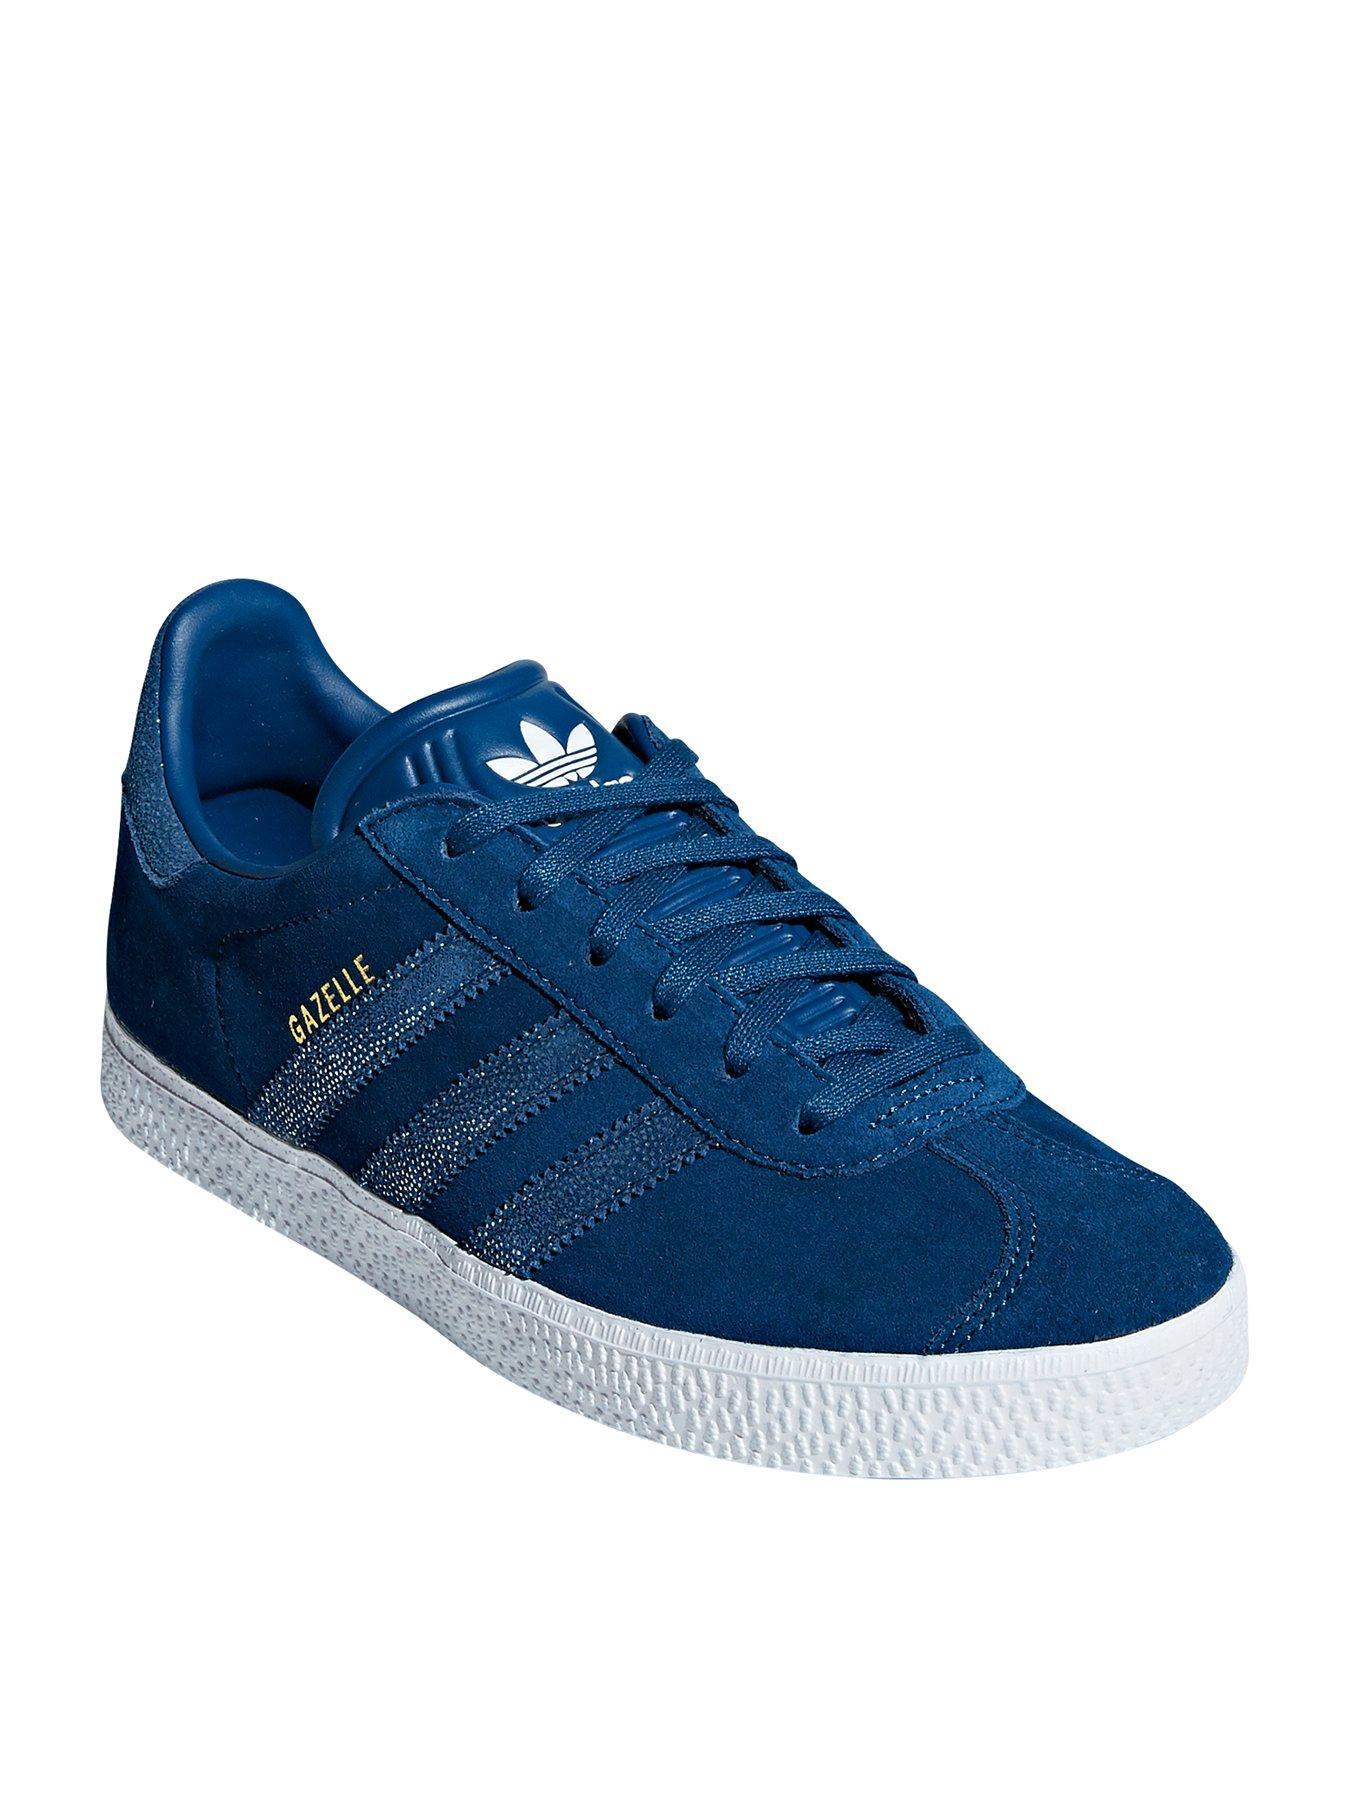 Blue | adidas Originals Gazelle | Kids & baby sports shoes